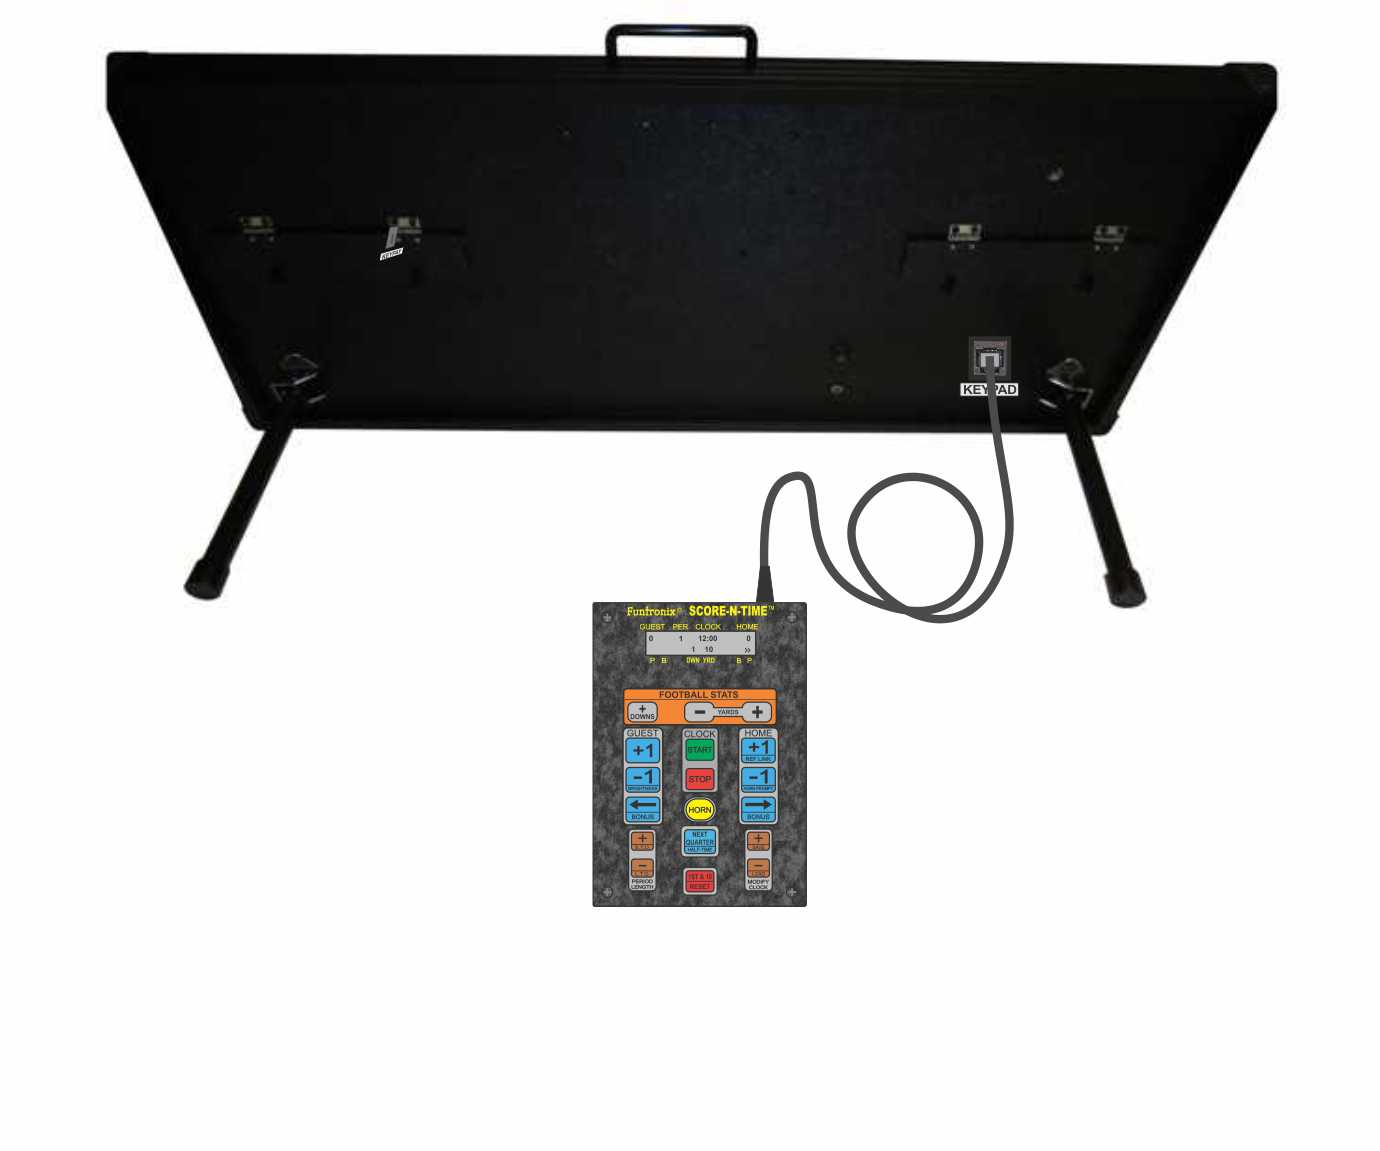 Portable Football Scoreboard Rear View